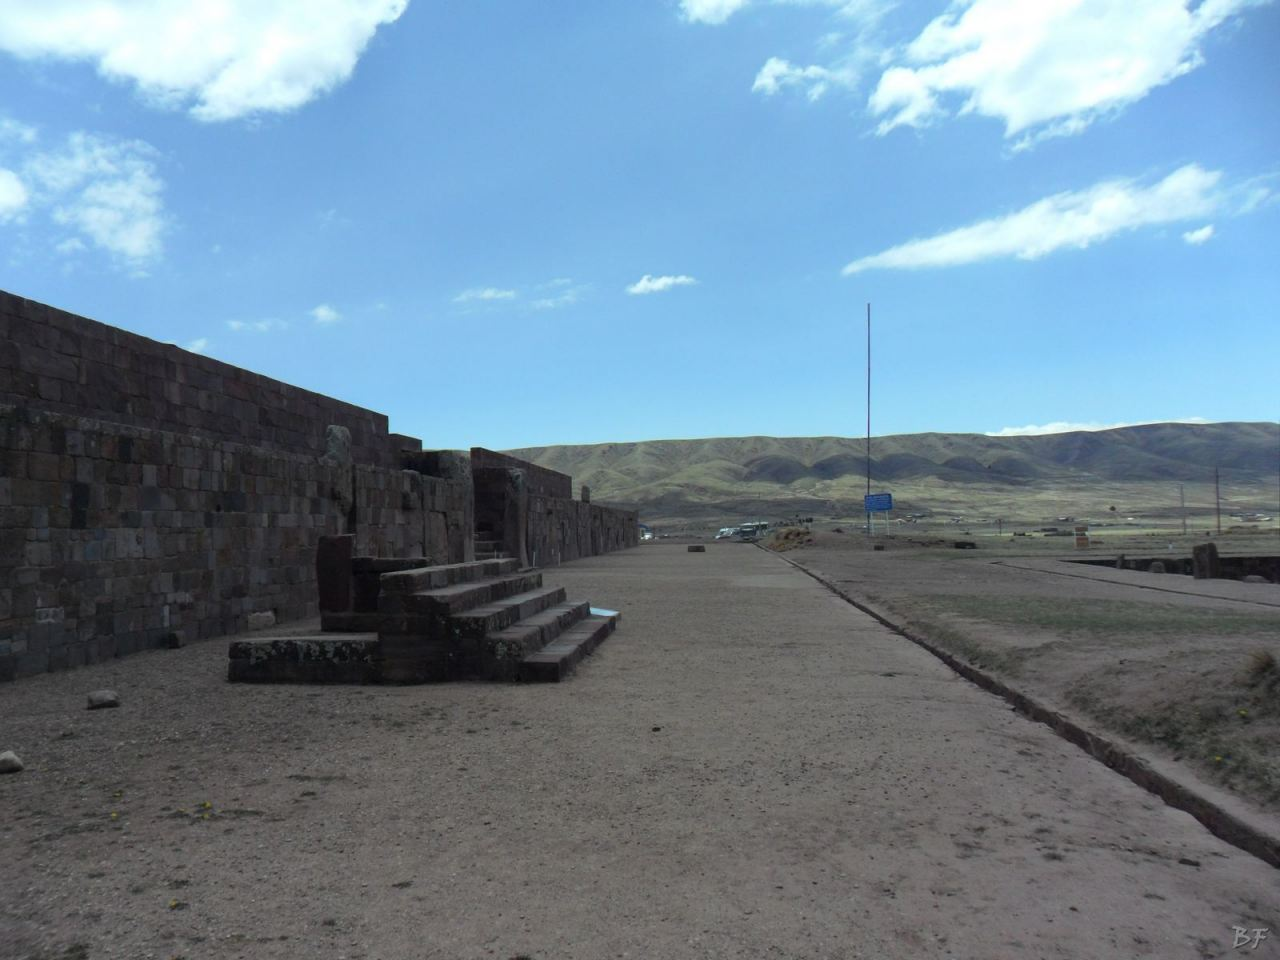 Sito-Megalitico-Piramide-Akapana-Kalasasaya-Menhir-Tiahuanaco-Bolivia-68